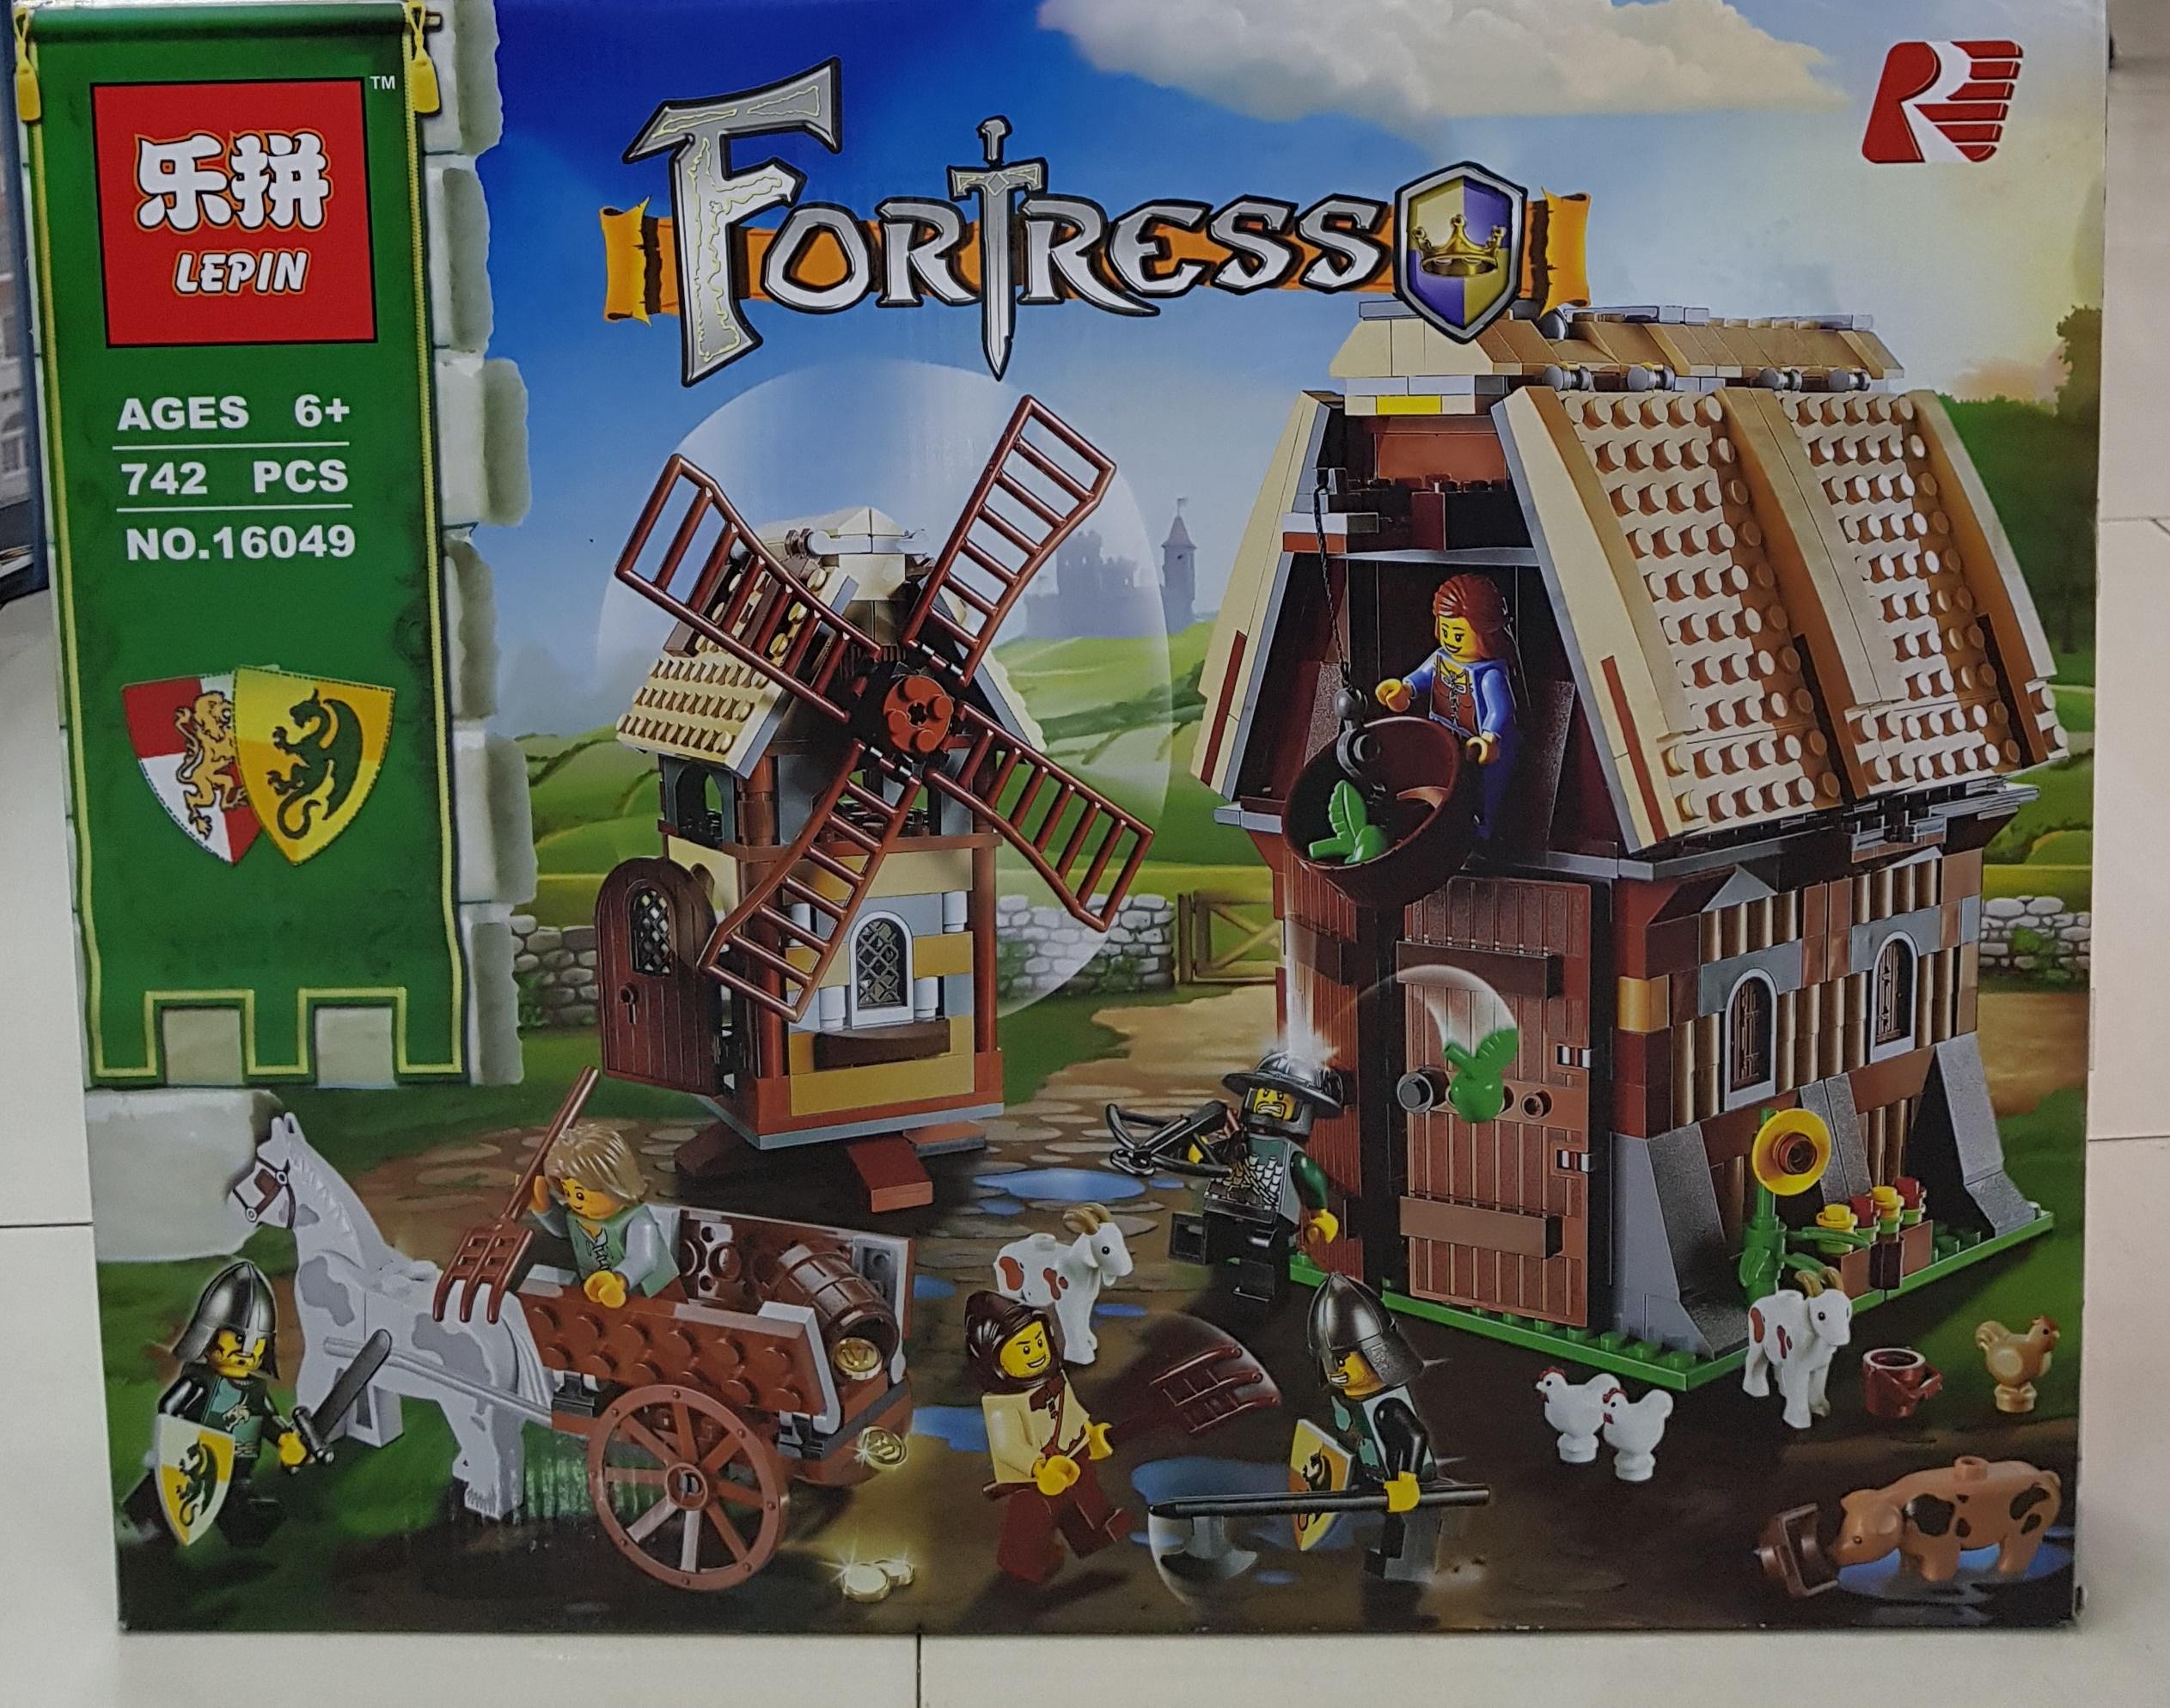 LEPIN FORTRESS 16049 (742ชิ้น)